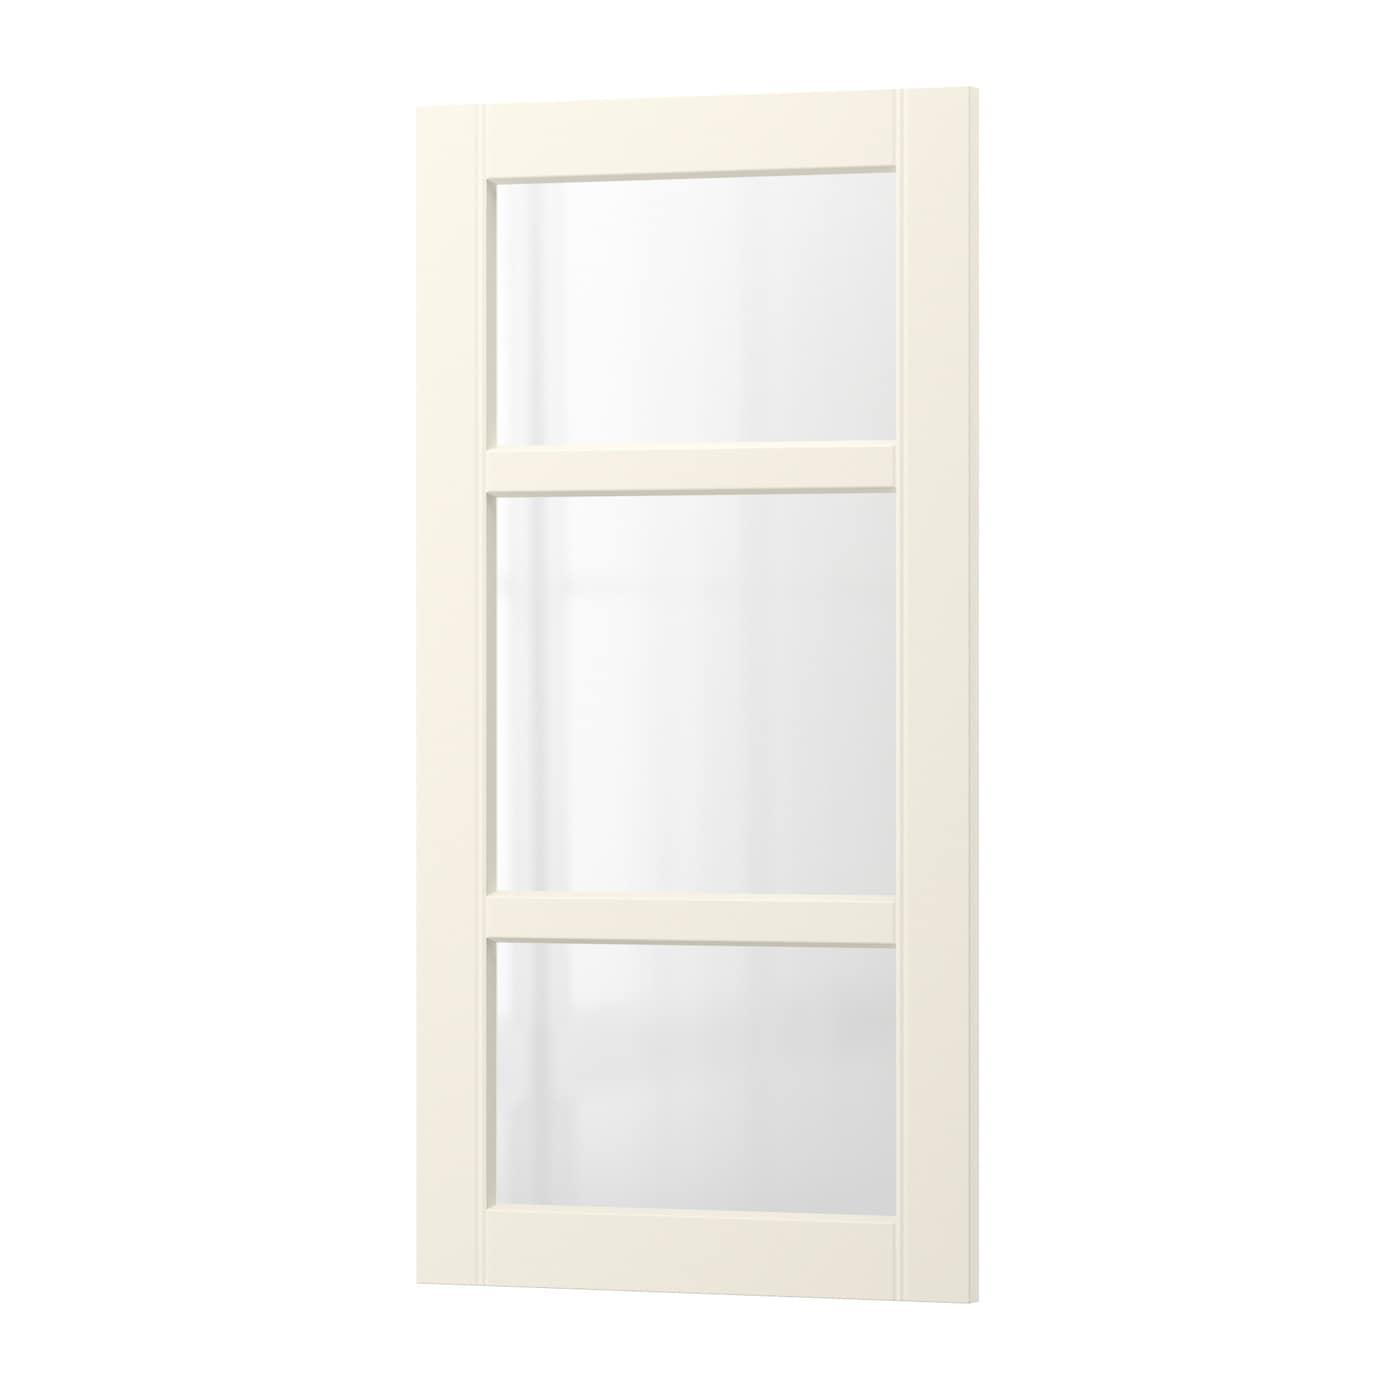 BODBYN Vitrinentür - elfenbeinweiß, 40x80 cm - IKEA